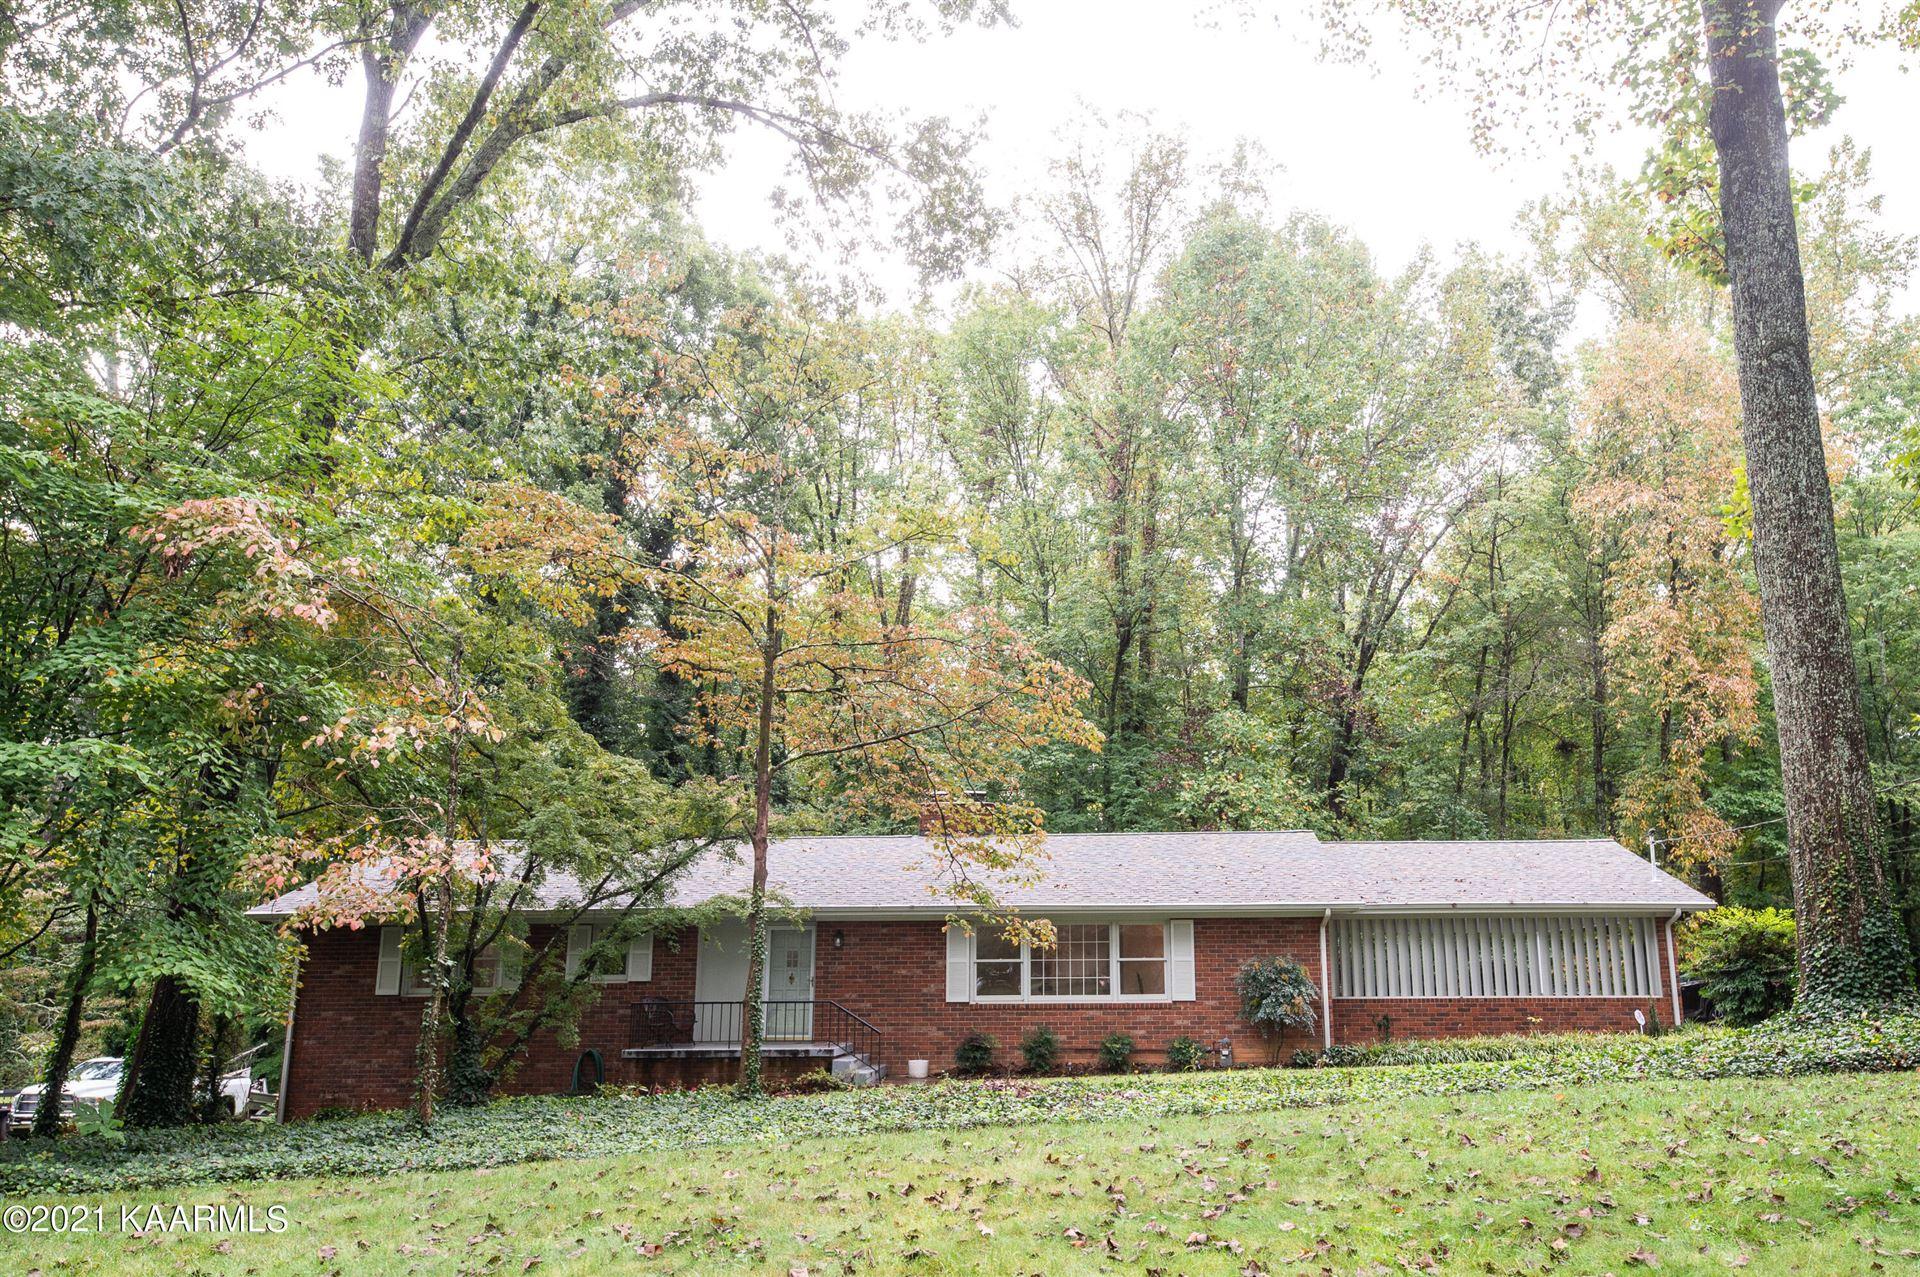 Photo of 1011 W. Outer Drive, Oak Ridge, TN 37830 (MLS # 1170400)